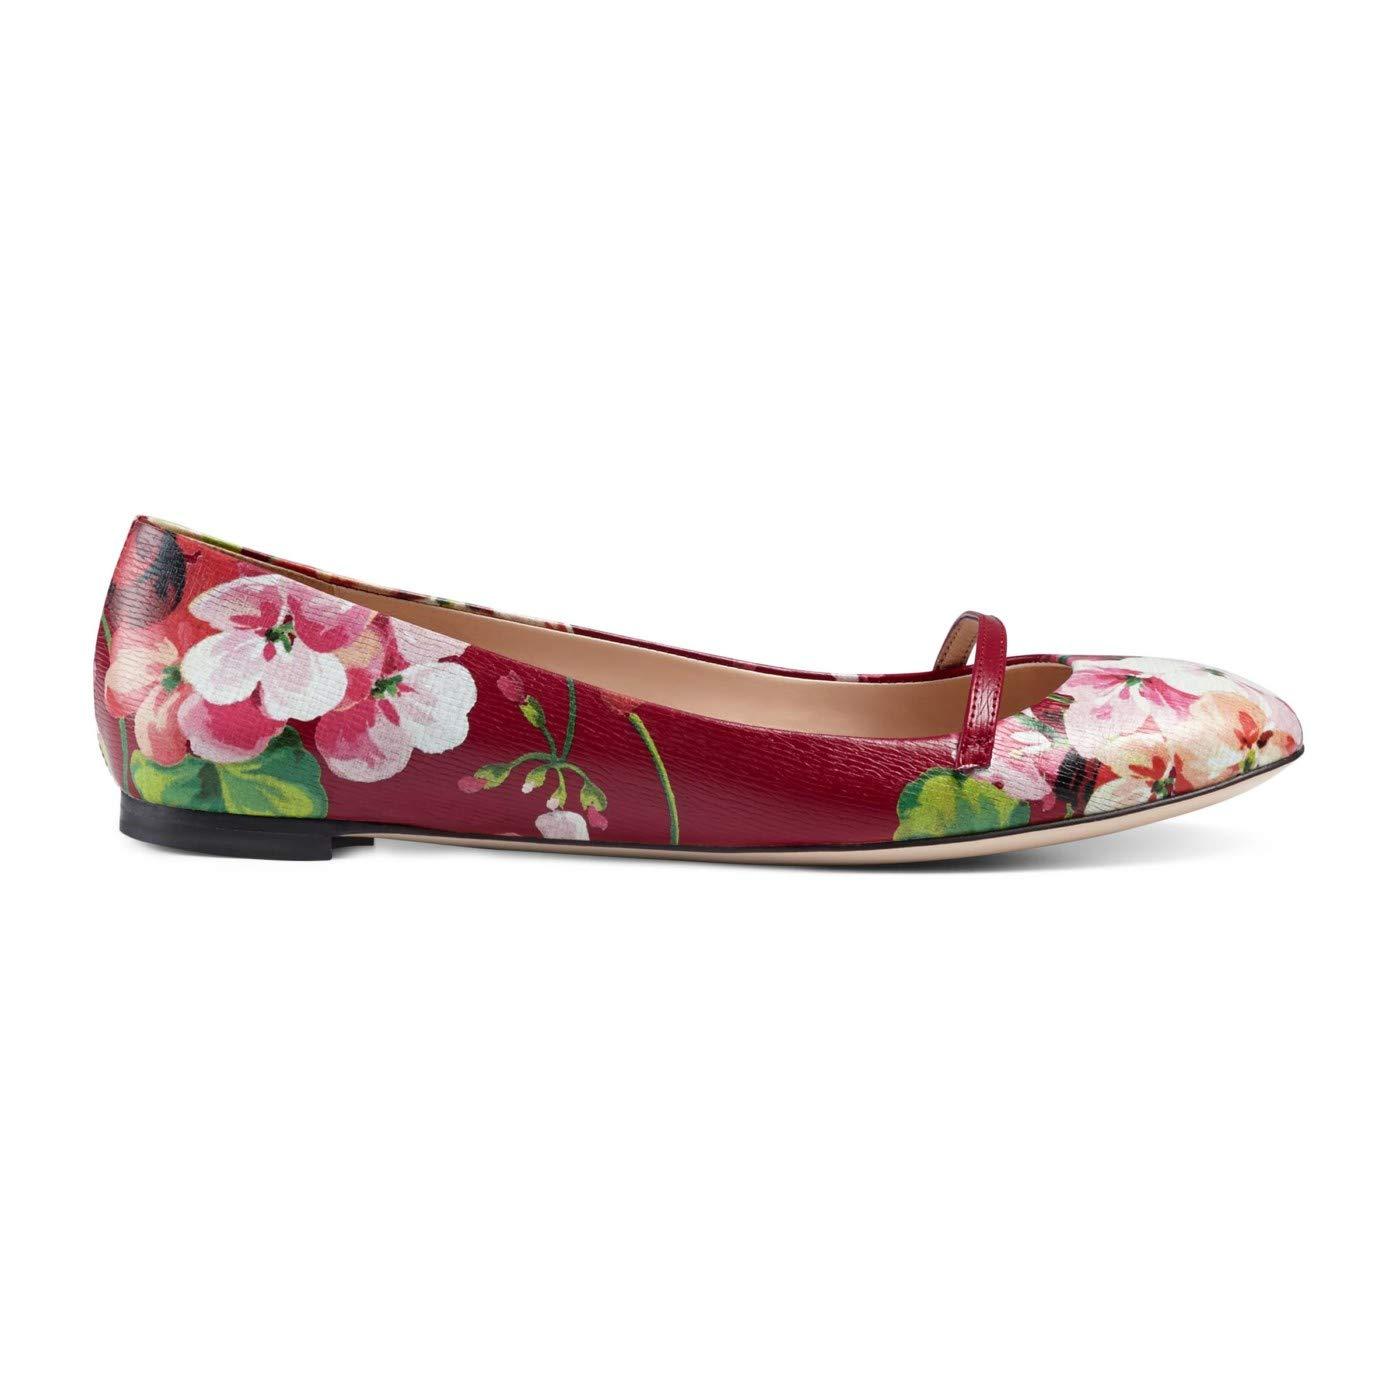 0b99f03b866 Amazon.com  Gucci Women s Leather Blooms Floral Print  Arielle  Ballerina Flats  Shoes